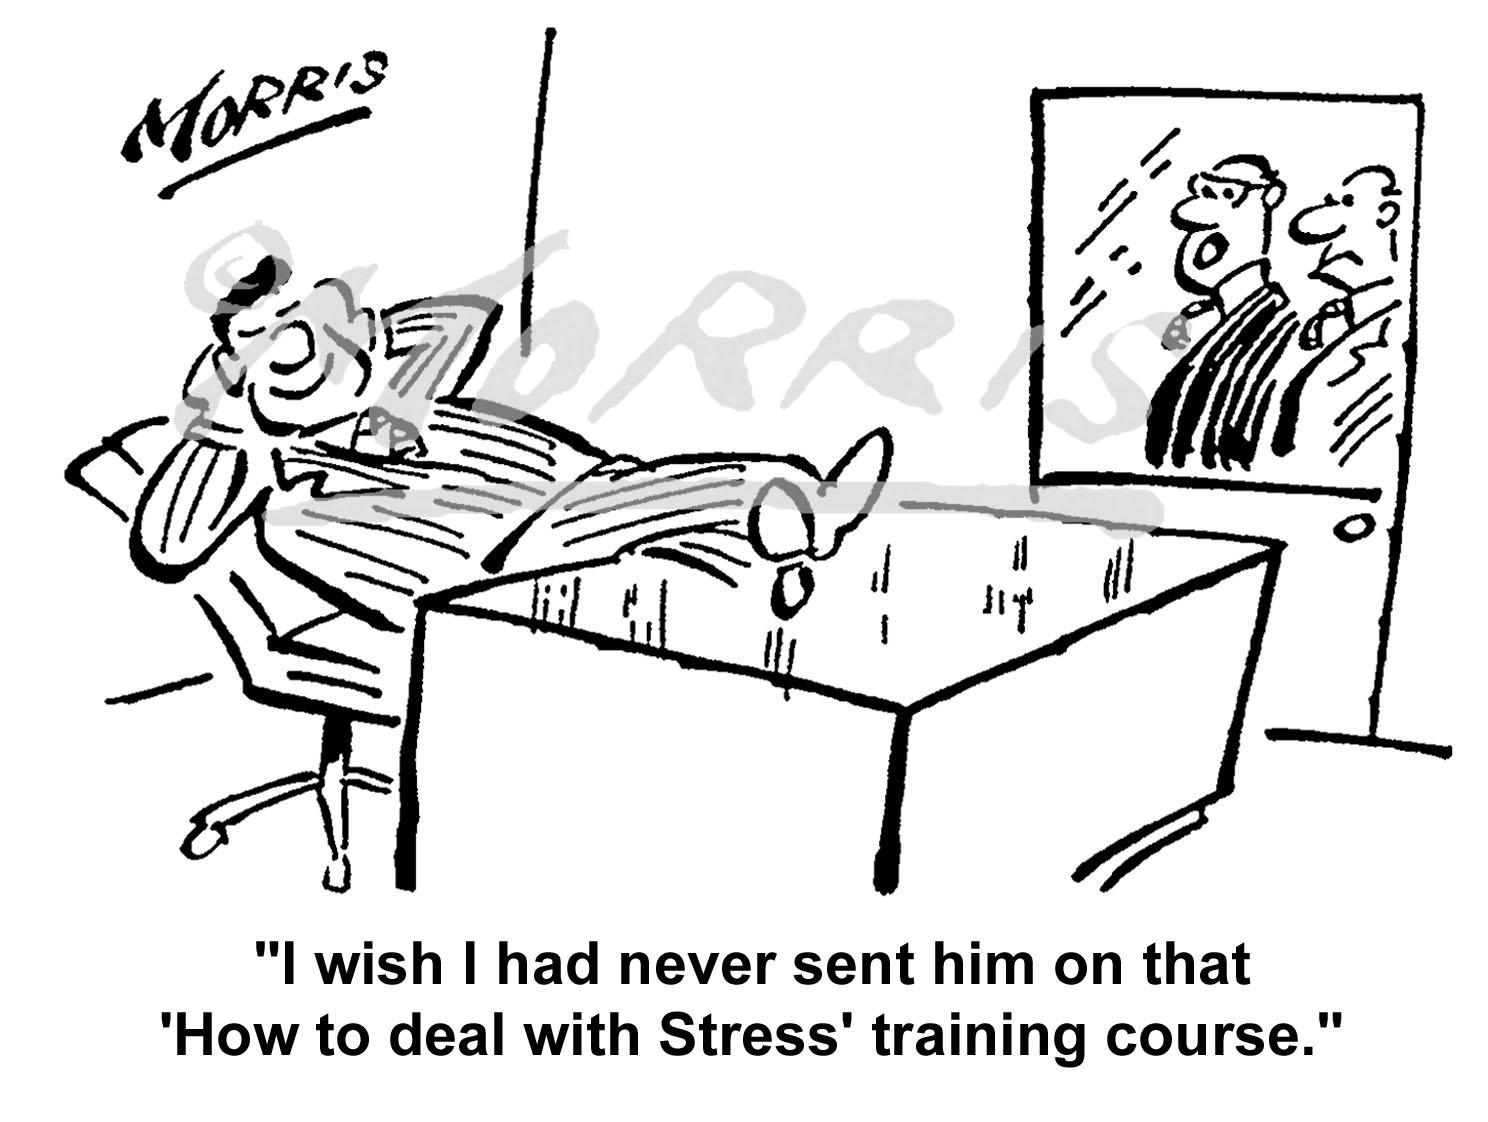 Office stress training course cartoon – Ref: 5086bw